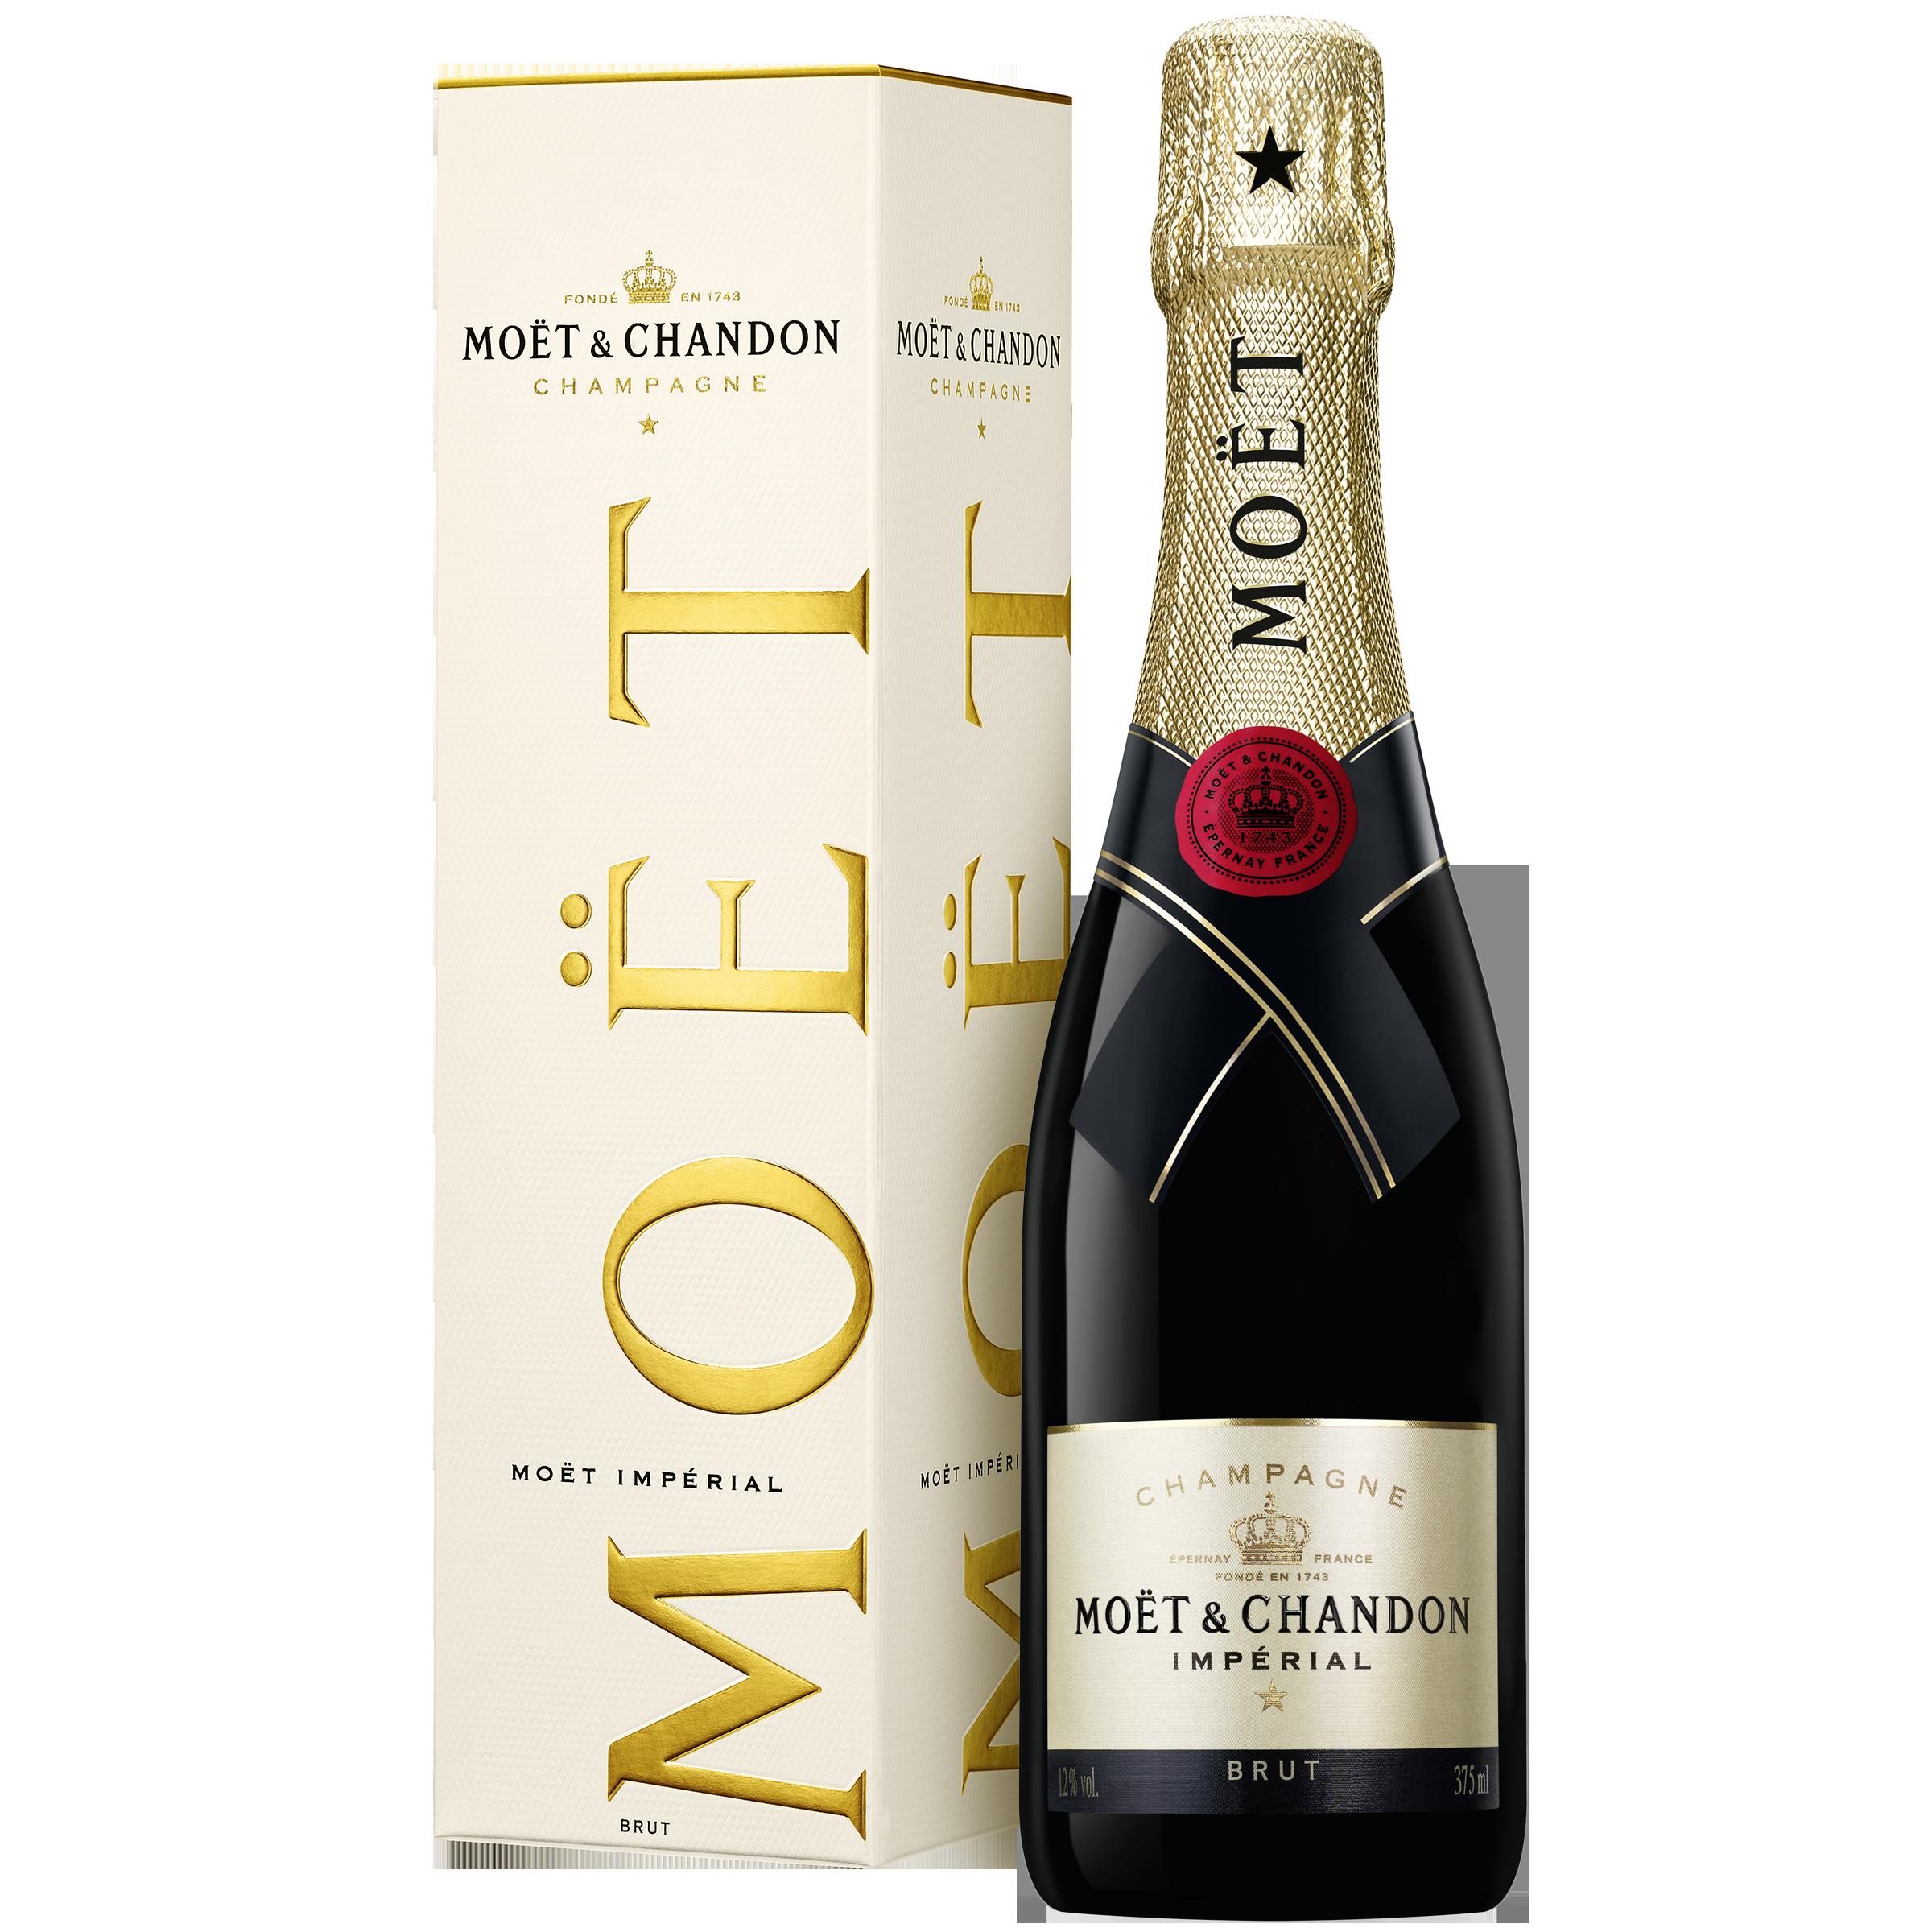 Moët & Chandon Brut Impérial 37.5CL Demi-bouteille in geschenkverpakking